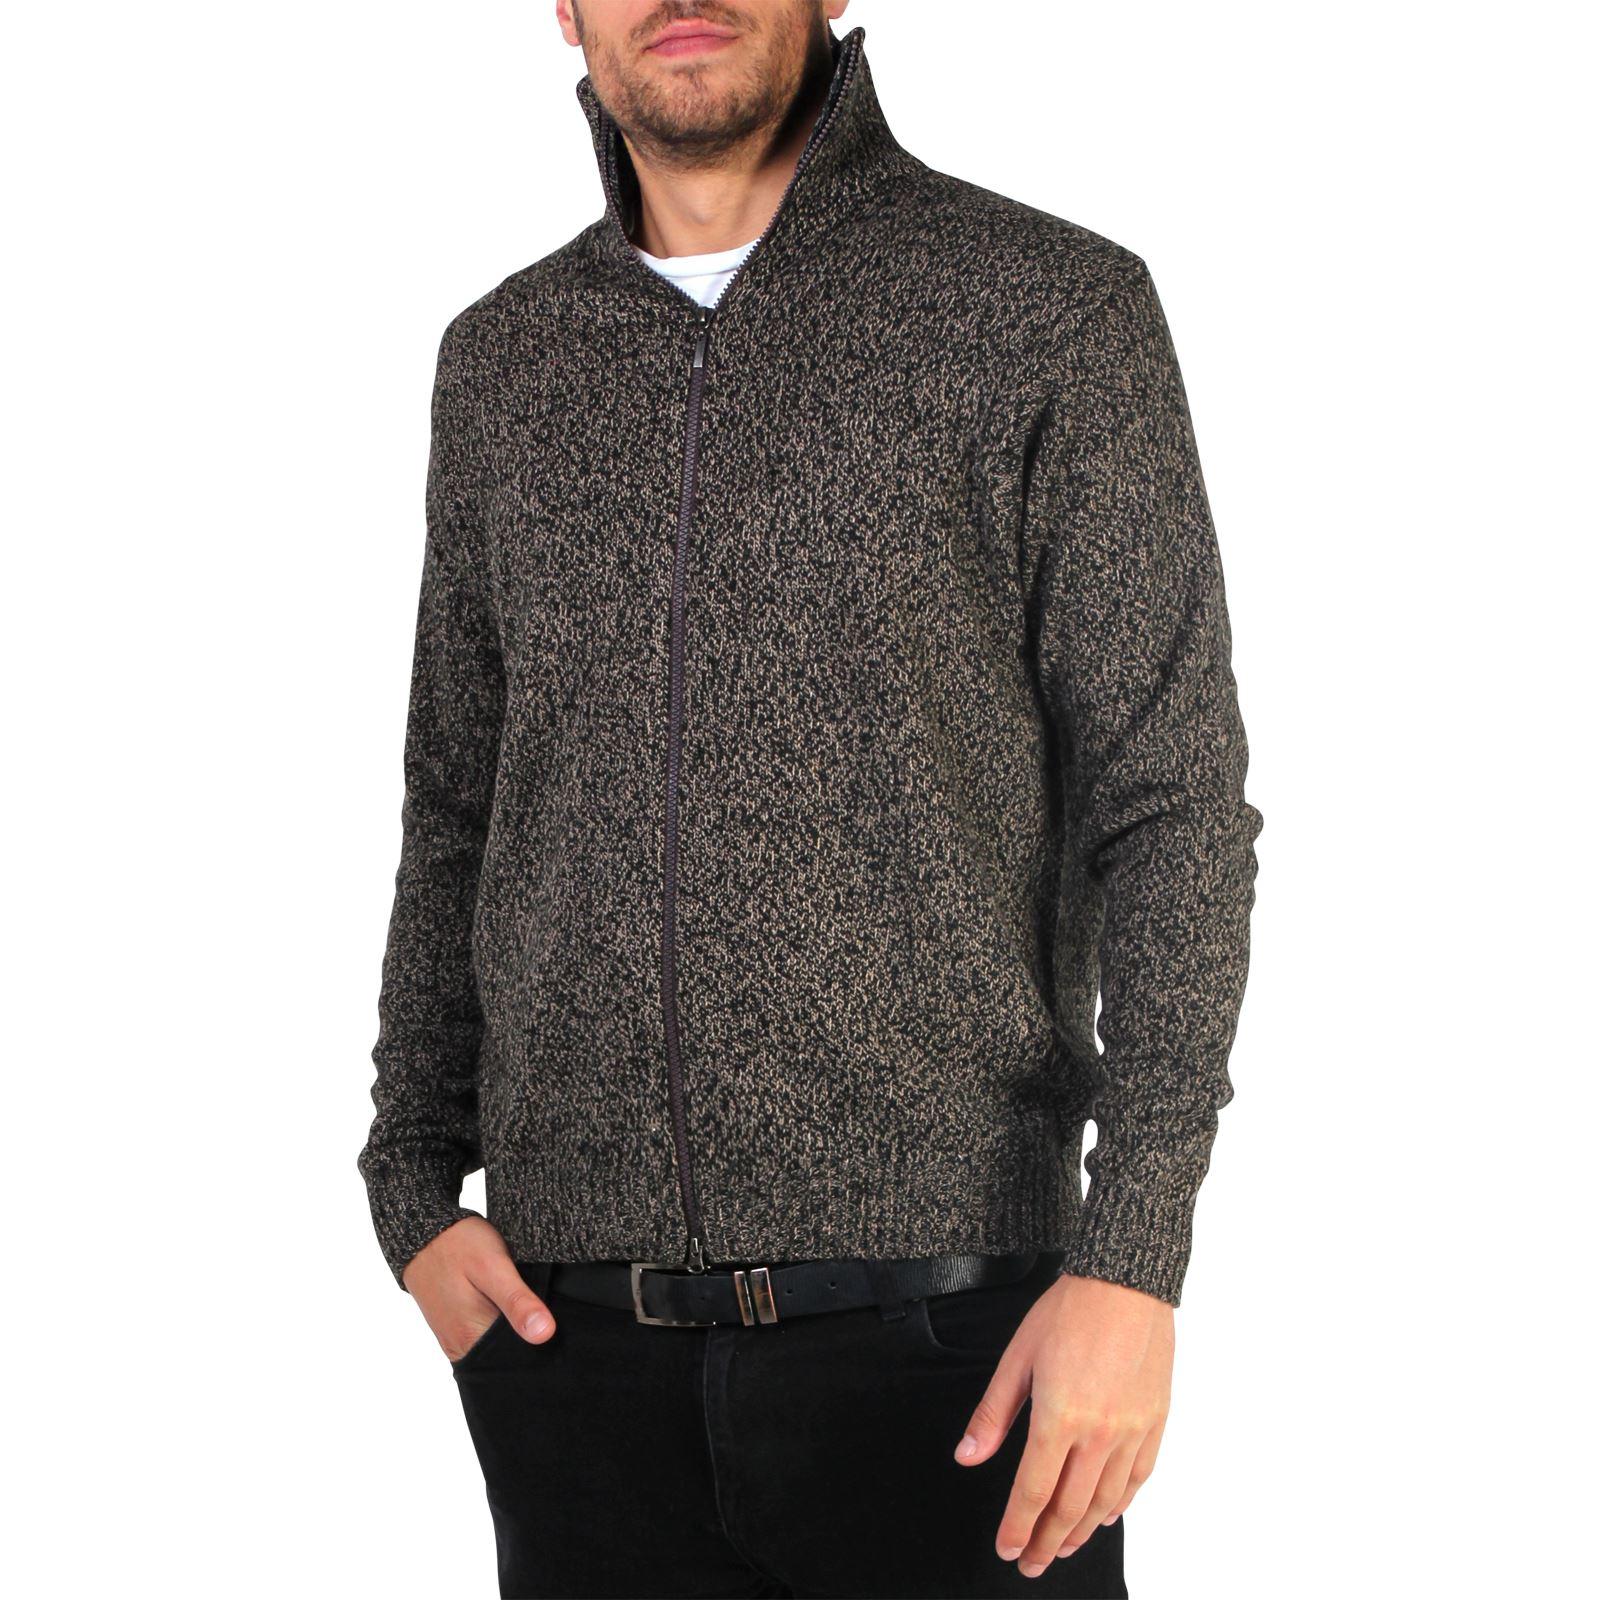 Mens-Wool-Jumper-Winter-Sweater-Zip-Up-Funnel-Neck-Soft-Knit-Cardigan-Top thumbnail 6